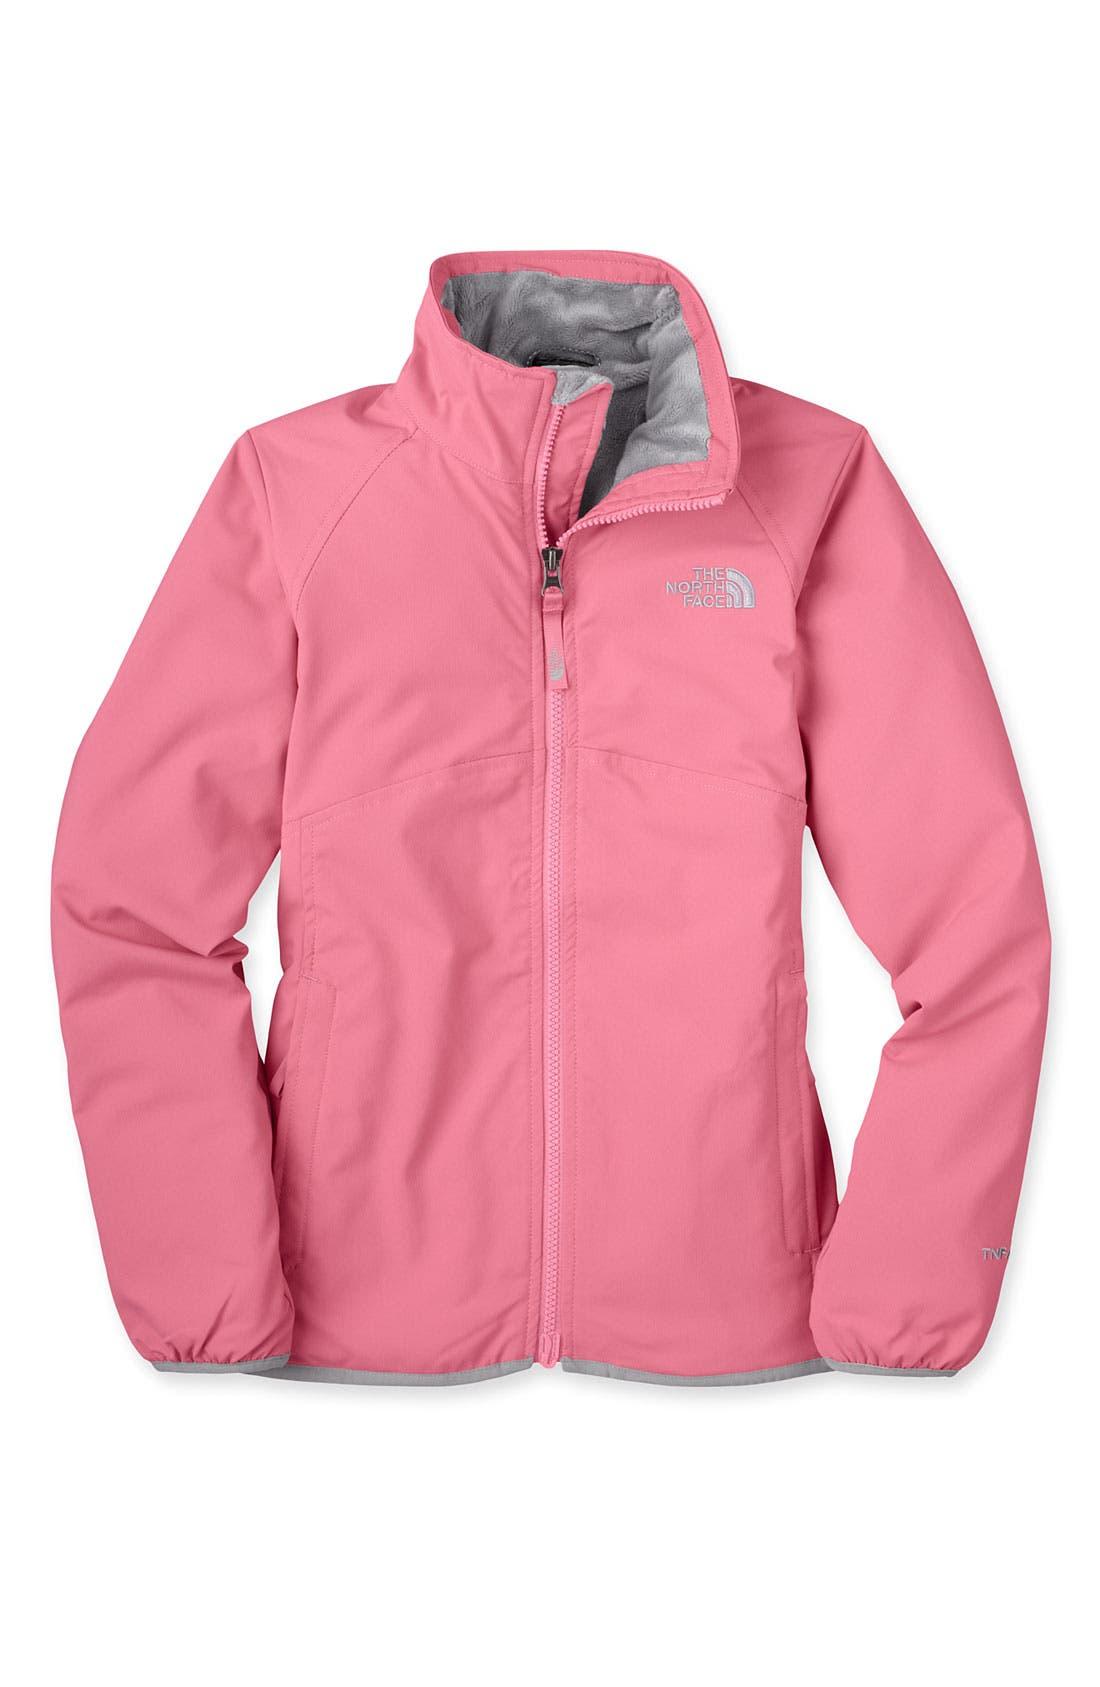 Main Image - The North Face 'Mossbud' Softshell Lightweight Jacket (Little Girls & Big Girls)